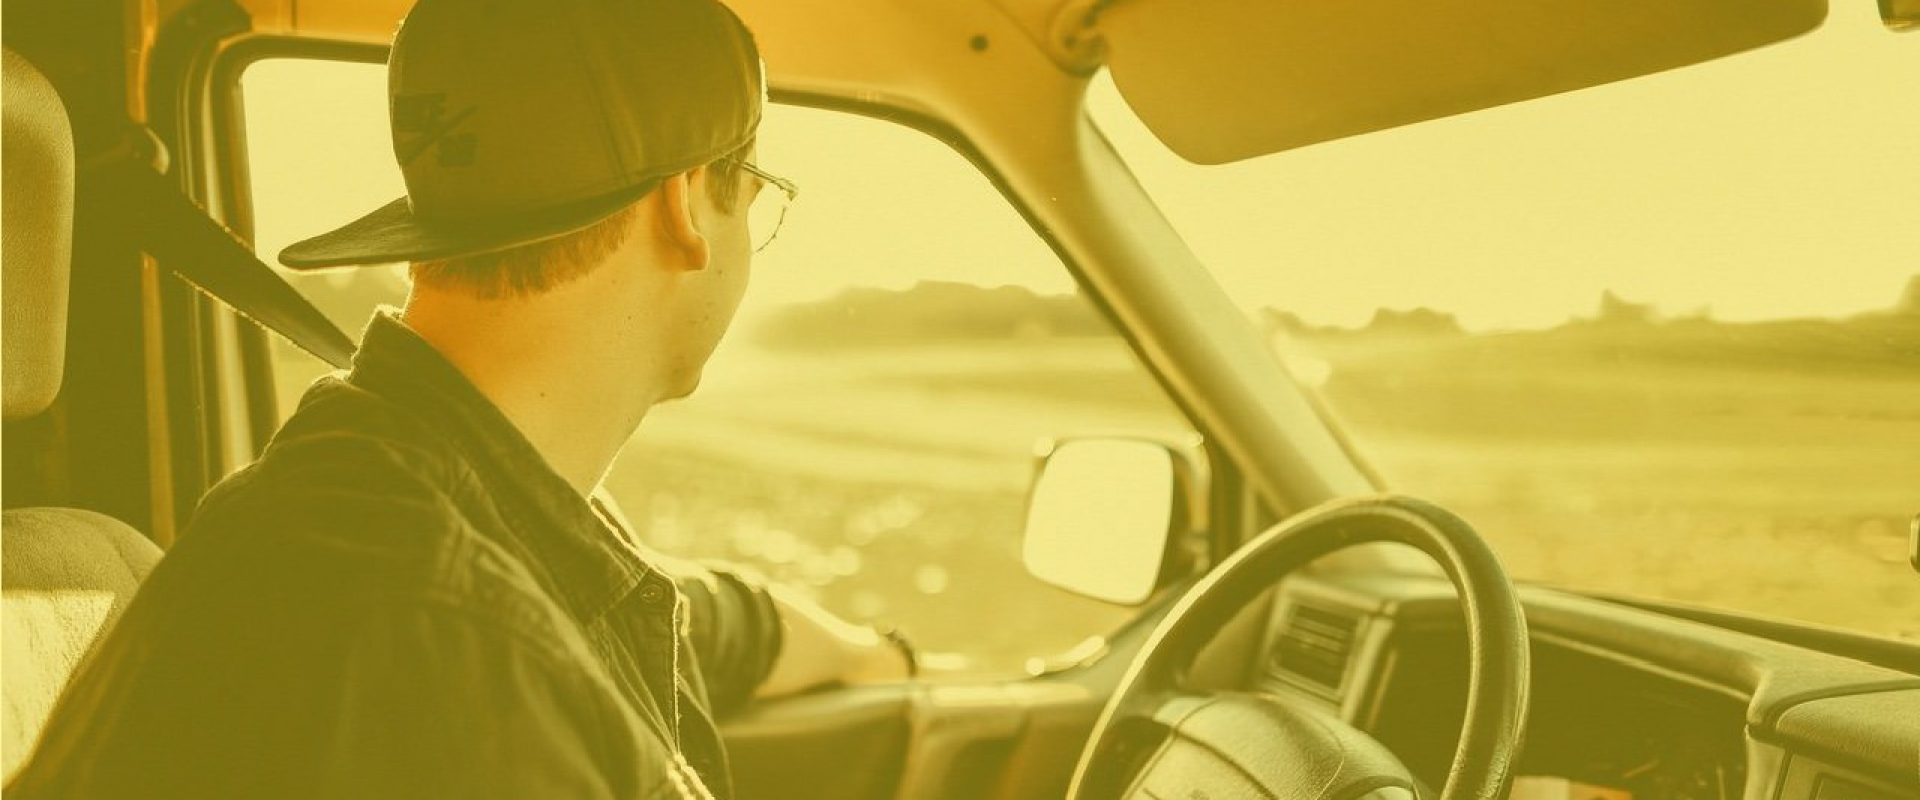 autista trasportatore trasporti consegne